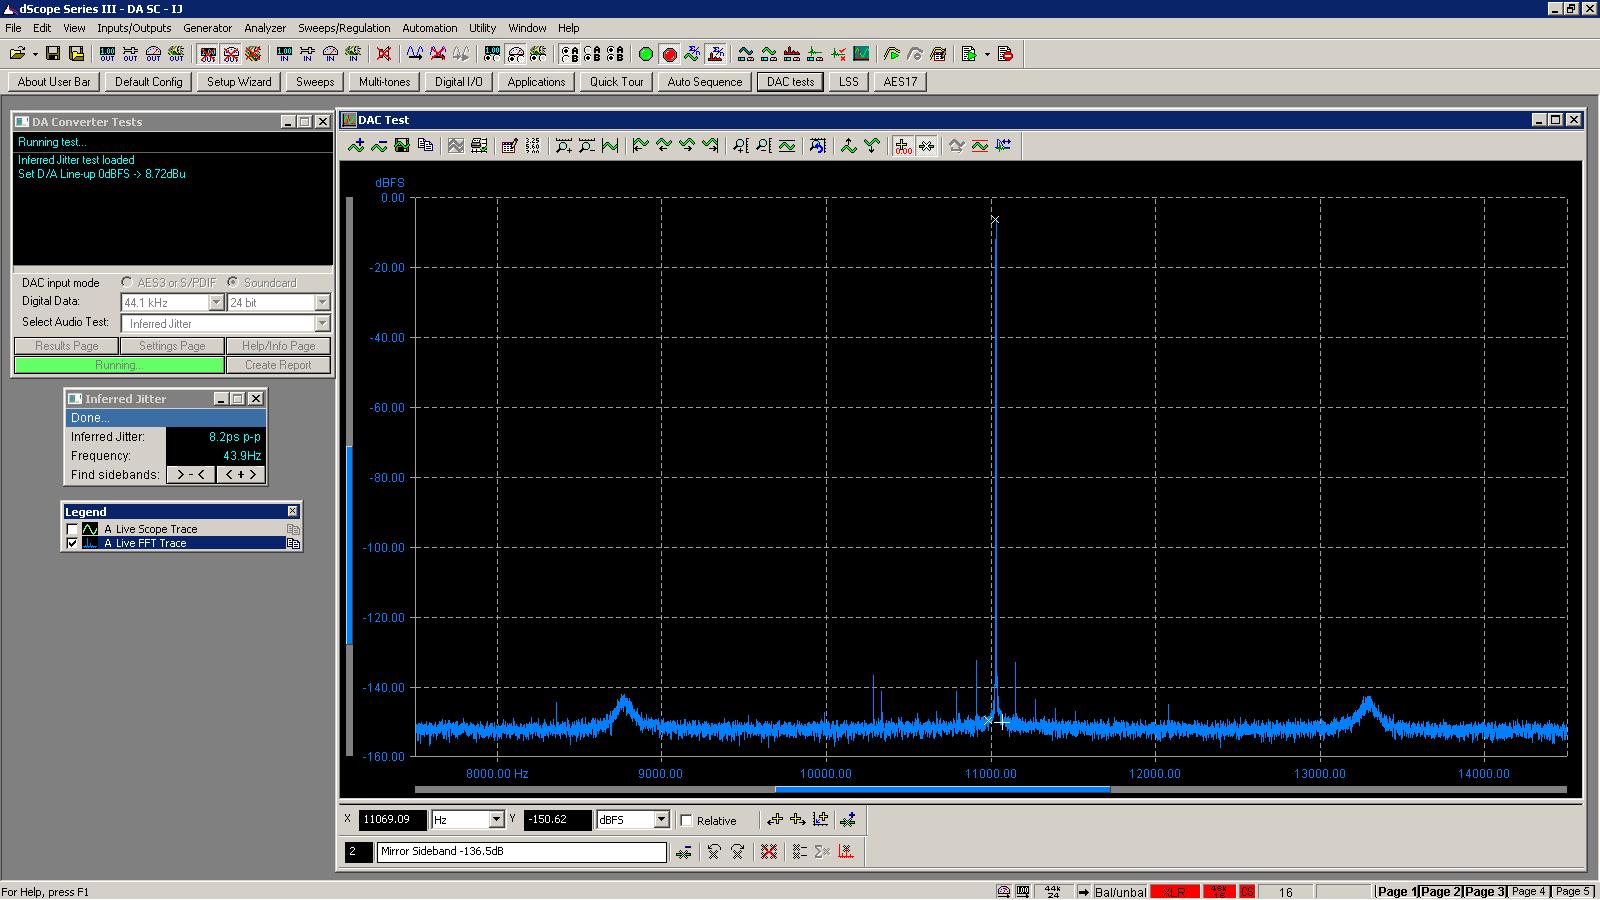 20151013 Bifrost MB SE inferred jitter - USB.PNG